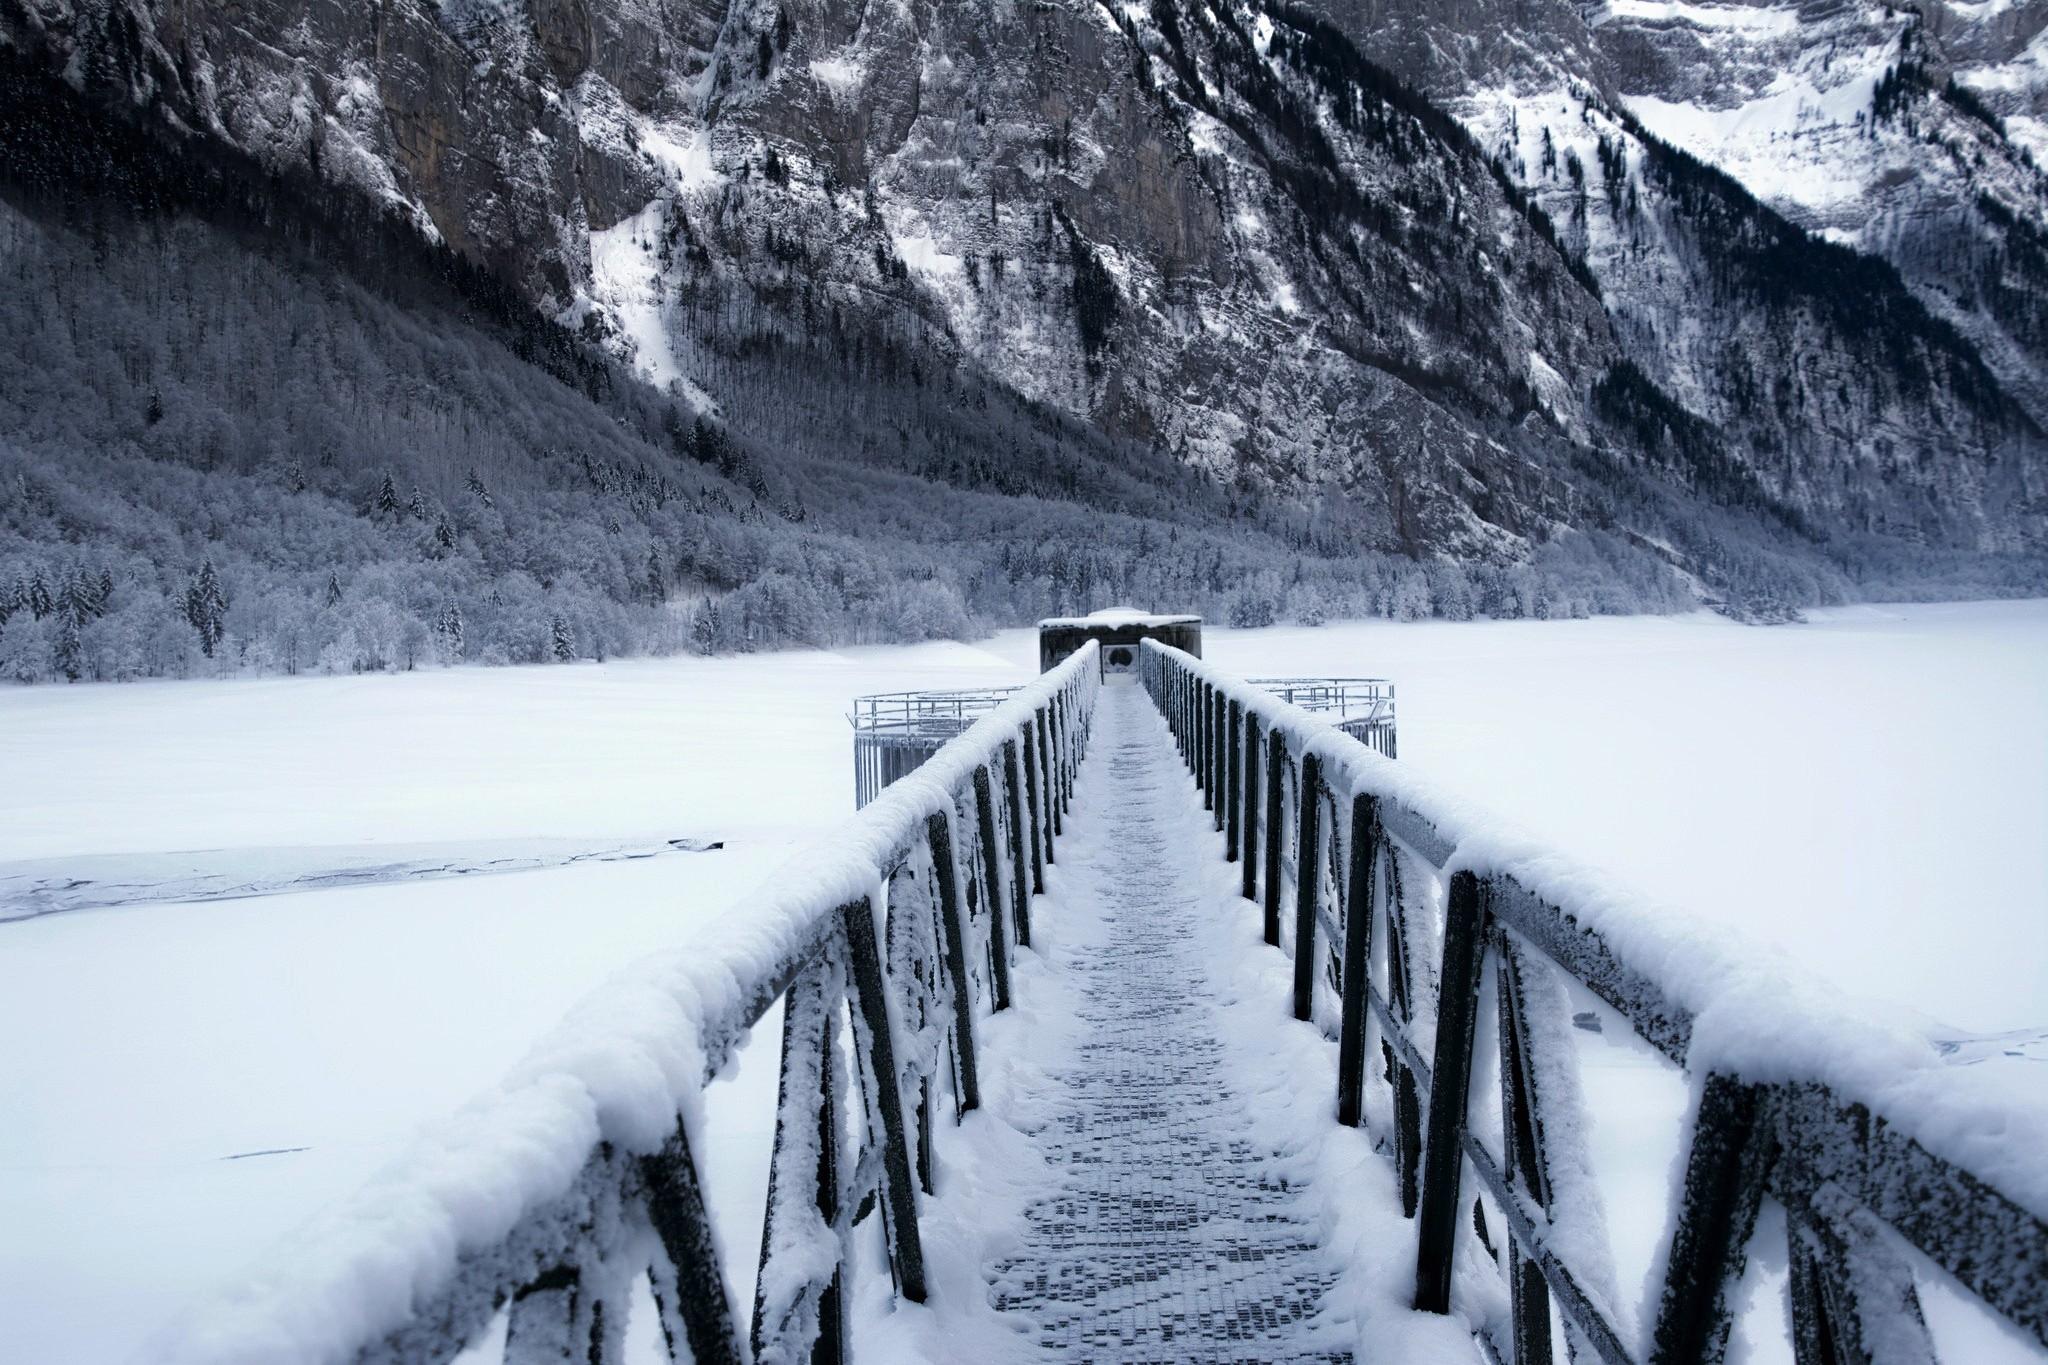 Wallpaper : landscape, mountains, nature, snow, winter, ice